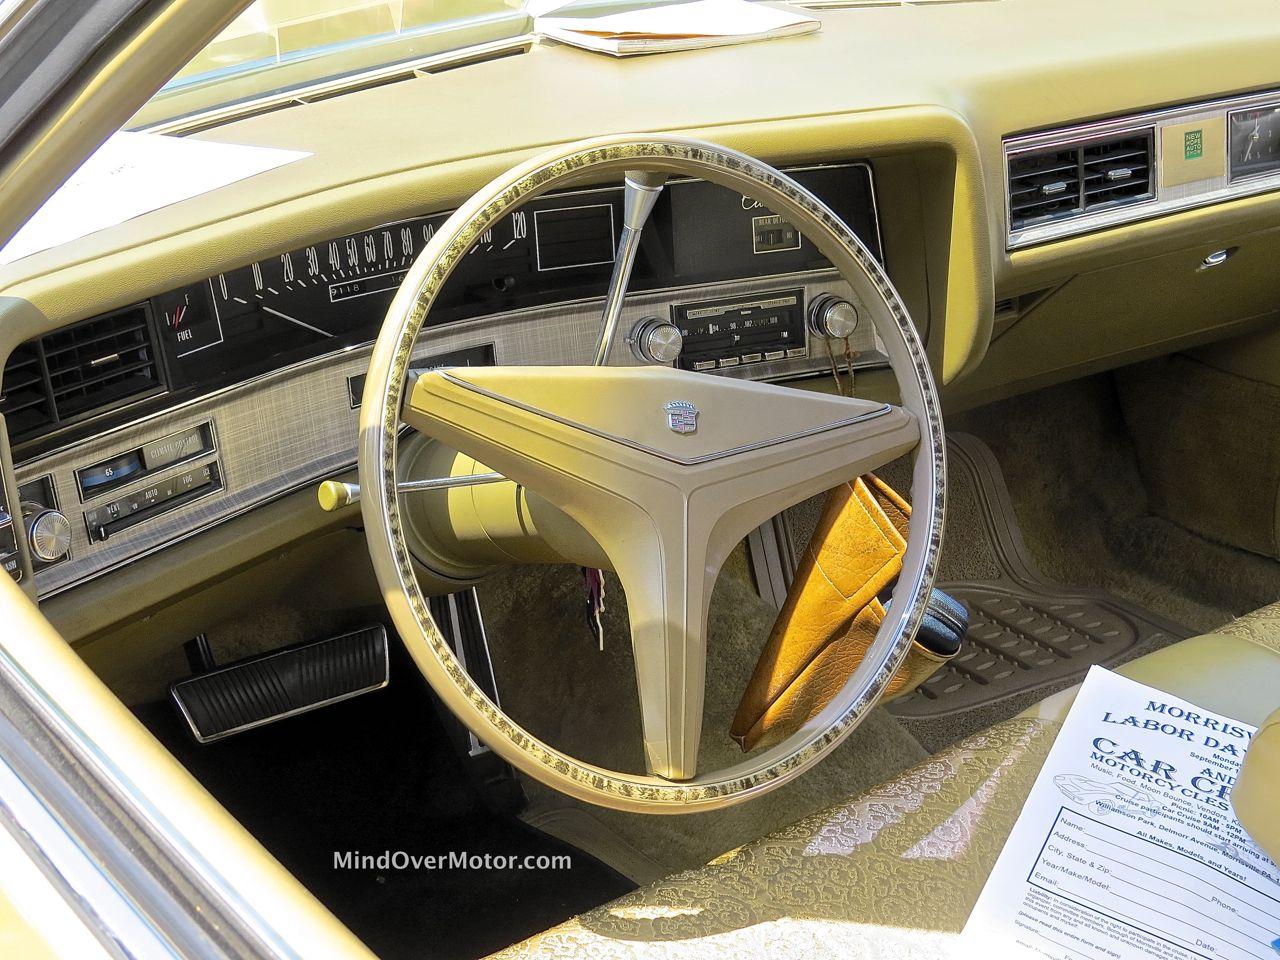 1971 Cadillac Sedan DeVille Interior